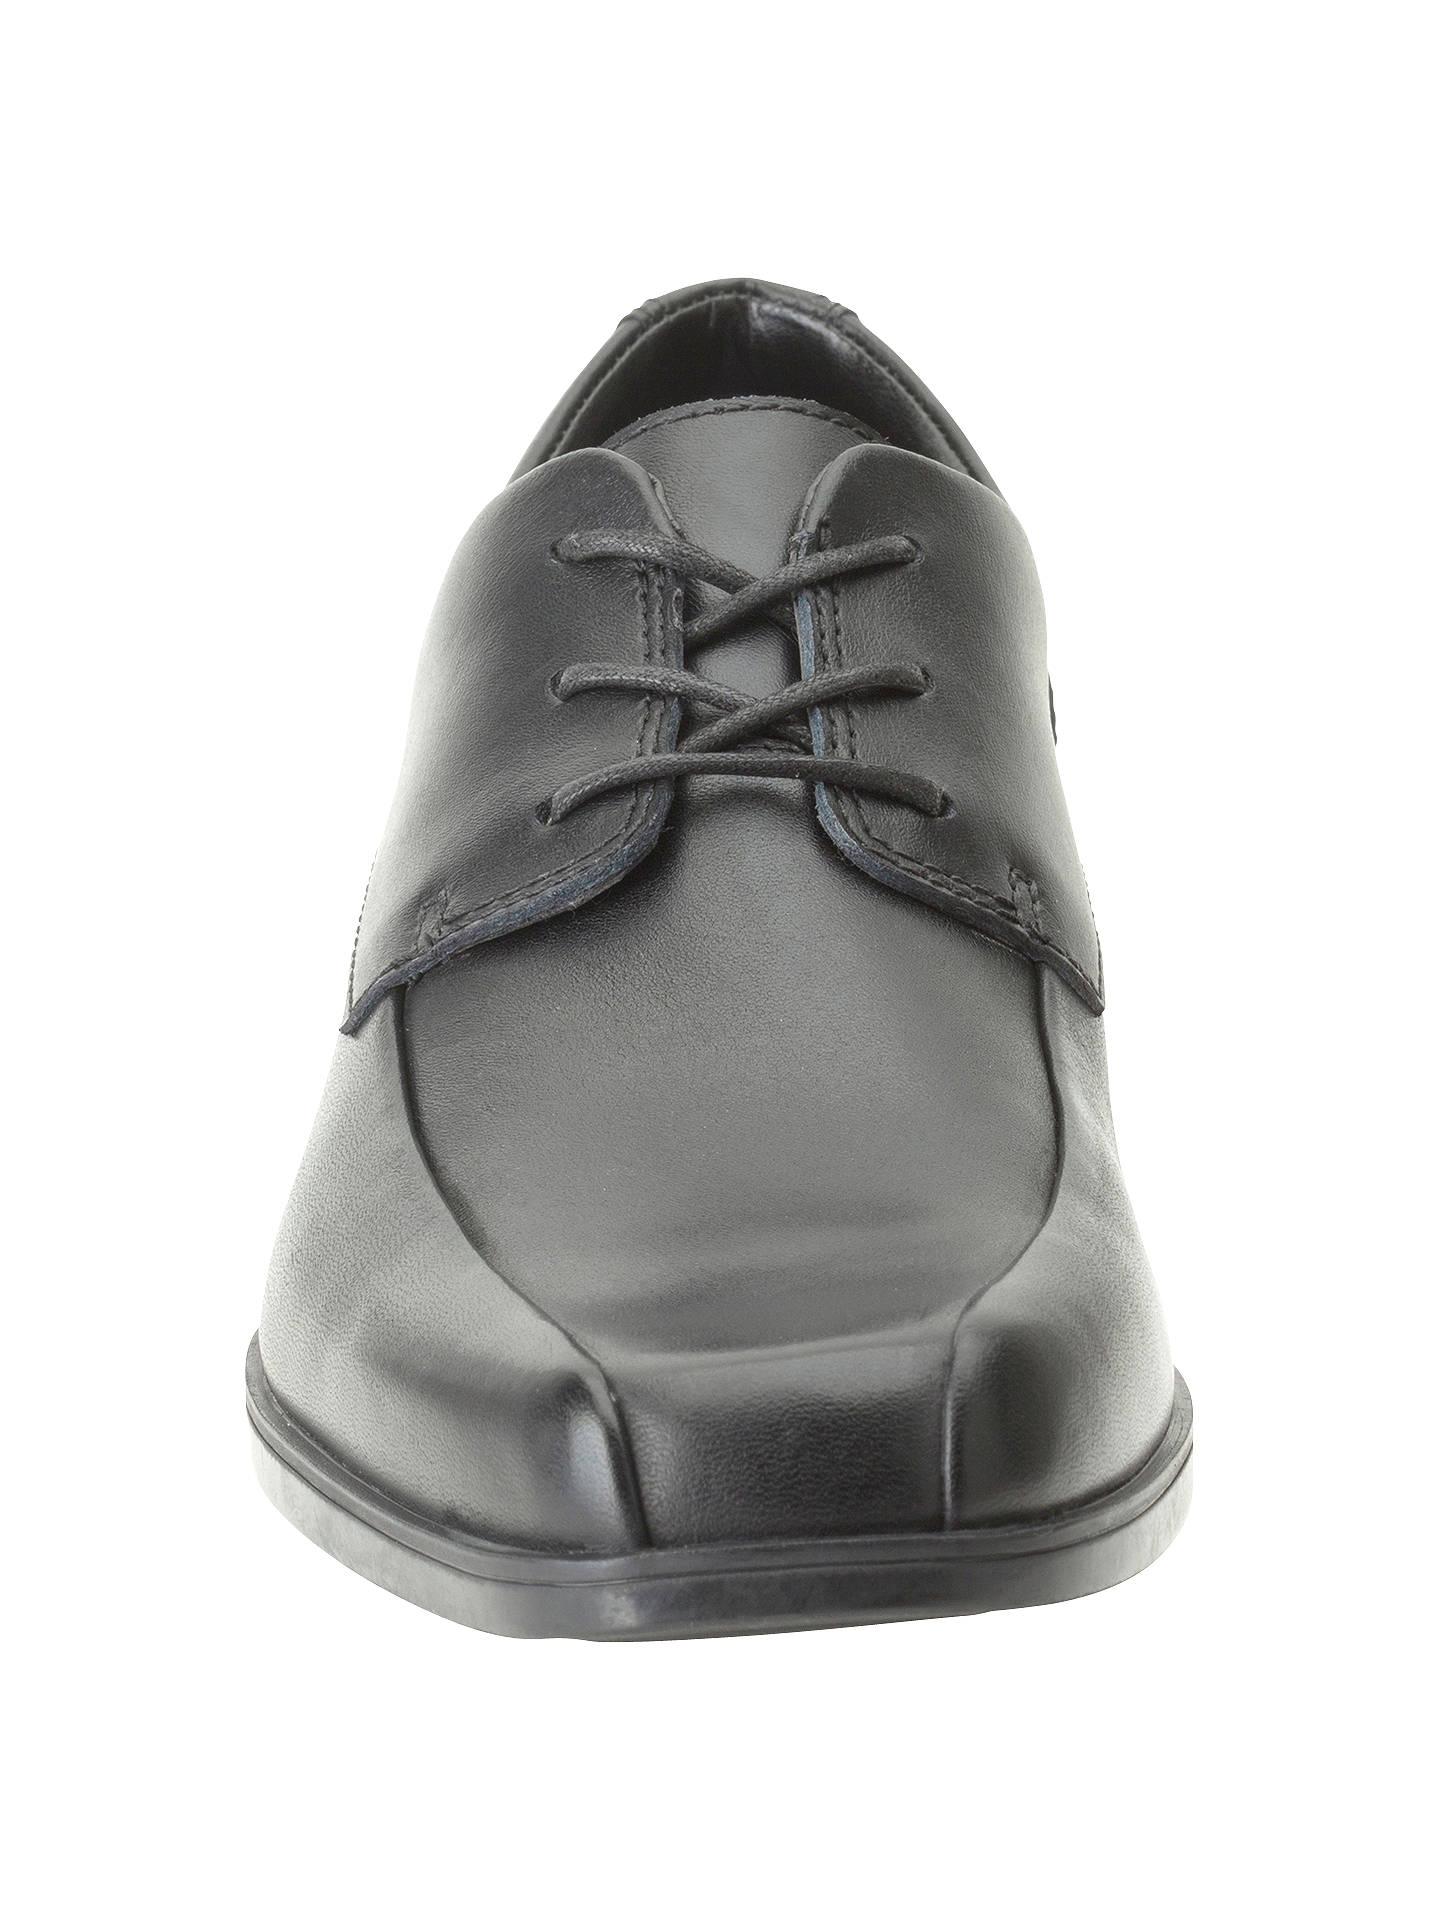 a20dc3b7d ... Buy Clarks Hoxton Chap Leather Shoes